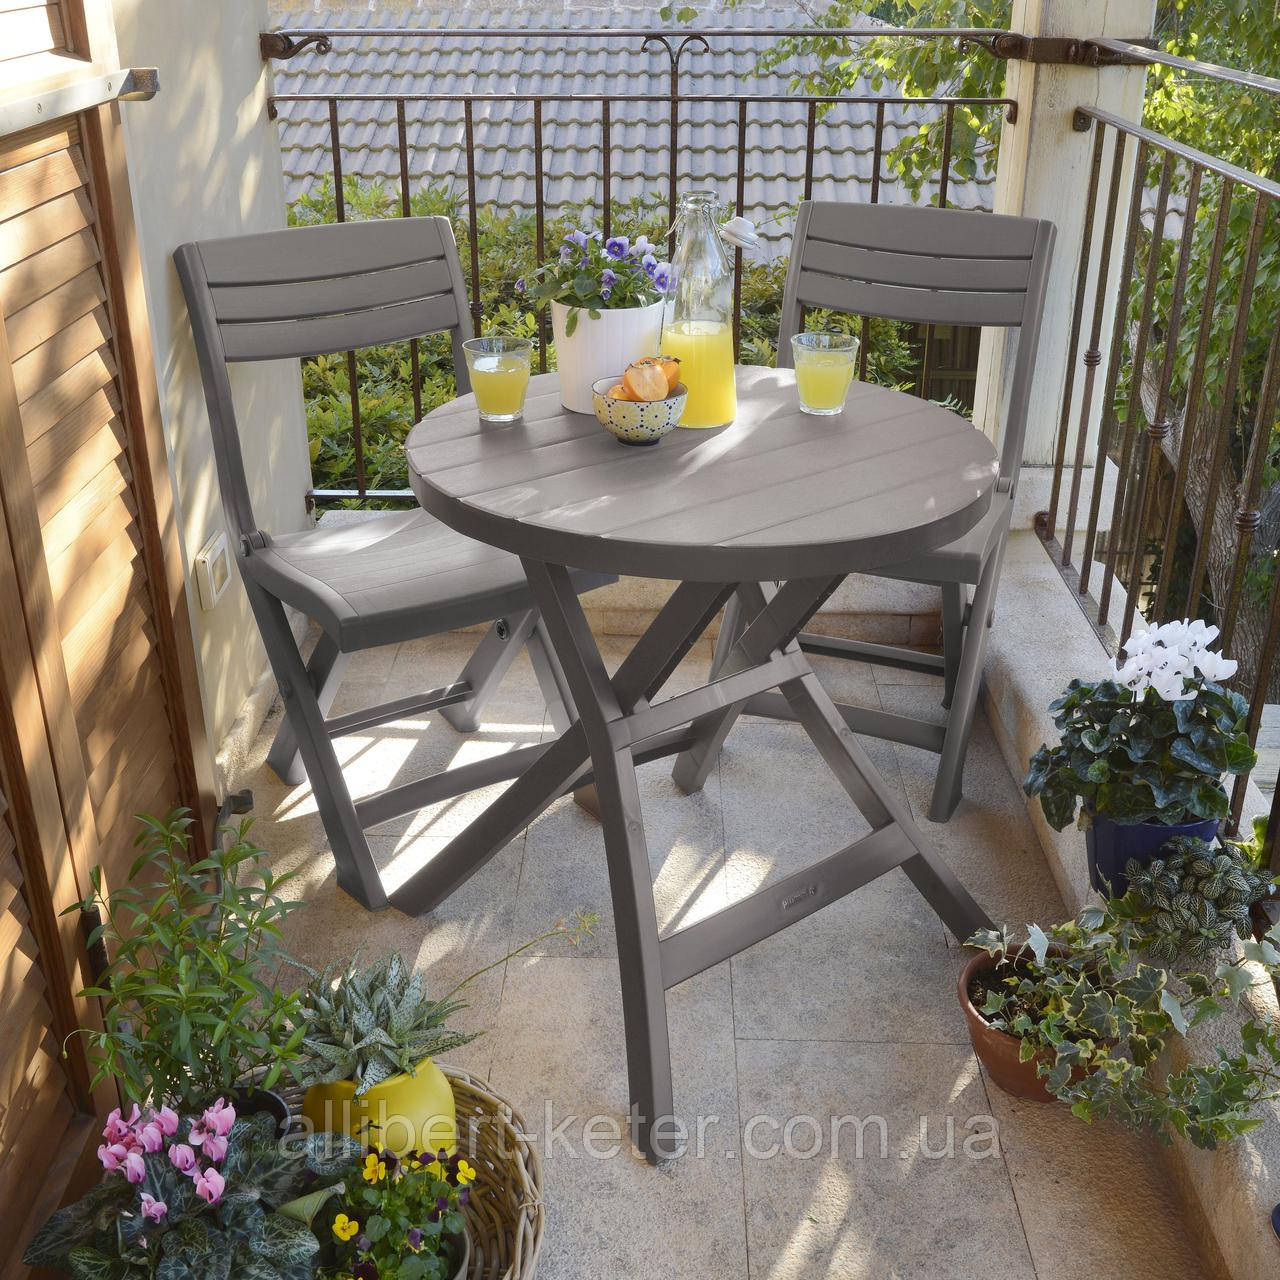 Набір садових меблів Jazz Set Cappuccino ( капучіно ) з штучного ротанга ( Allibert by Keter )